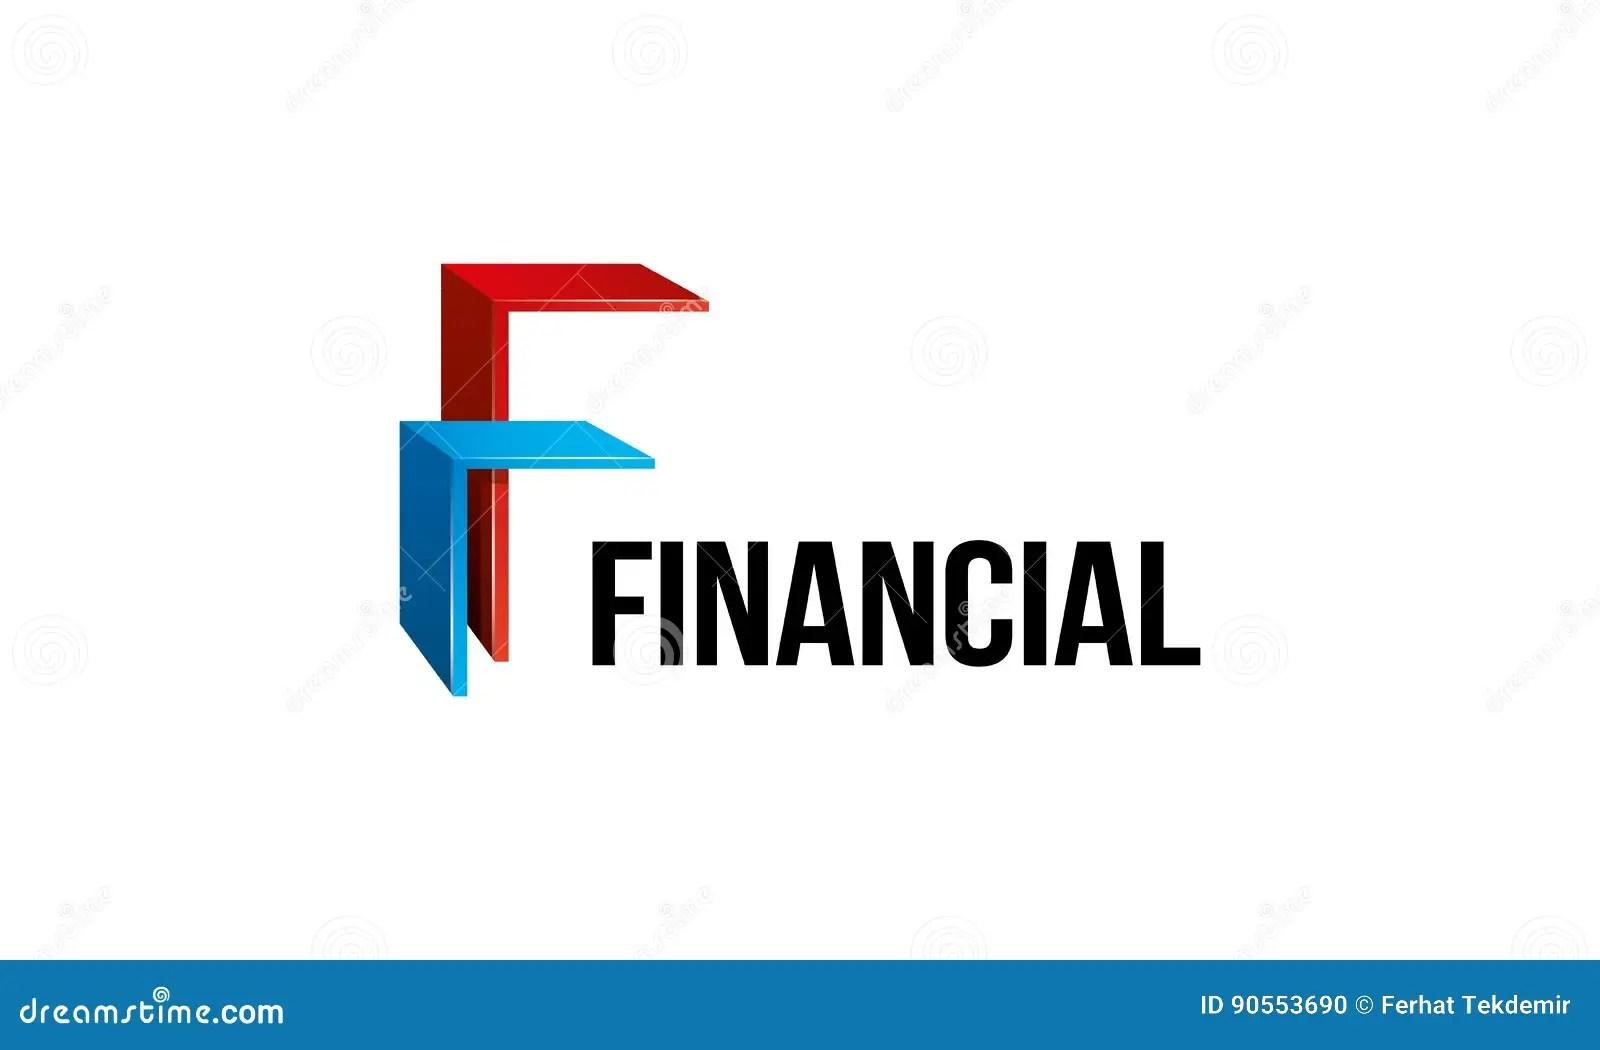 Financial Logo stock illustration. Image of analysia